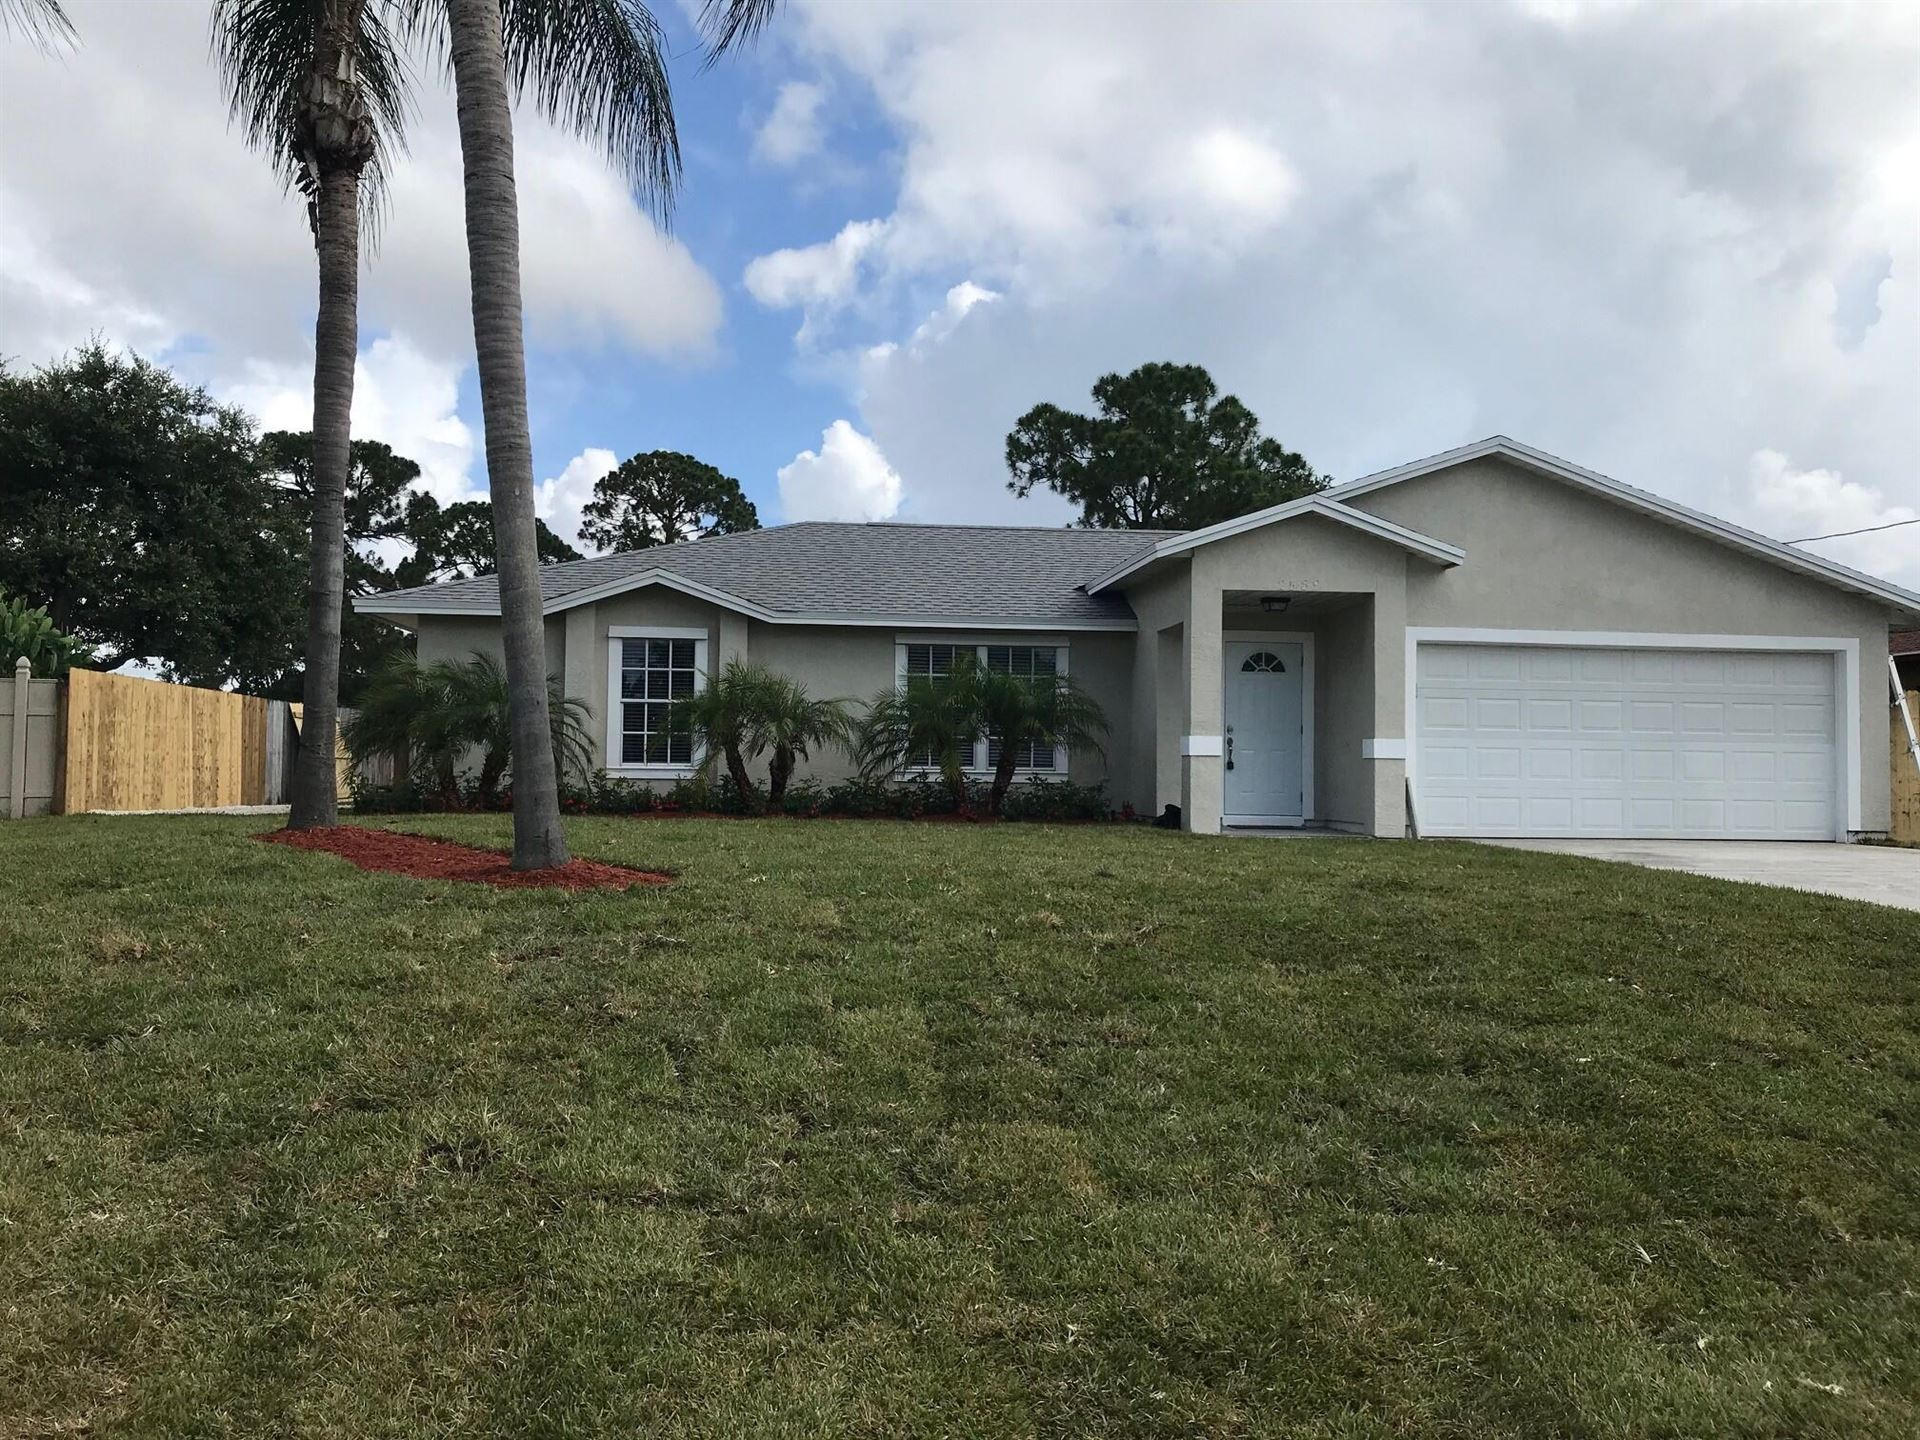 2589 SW Barber Lane, Port Saint Lucie, FL 34984 - MLS#: RX-10721595